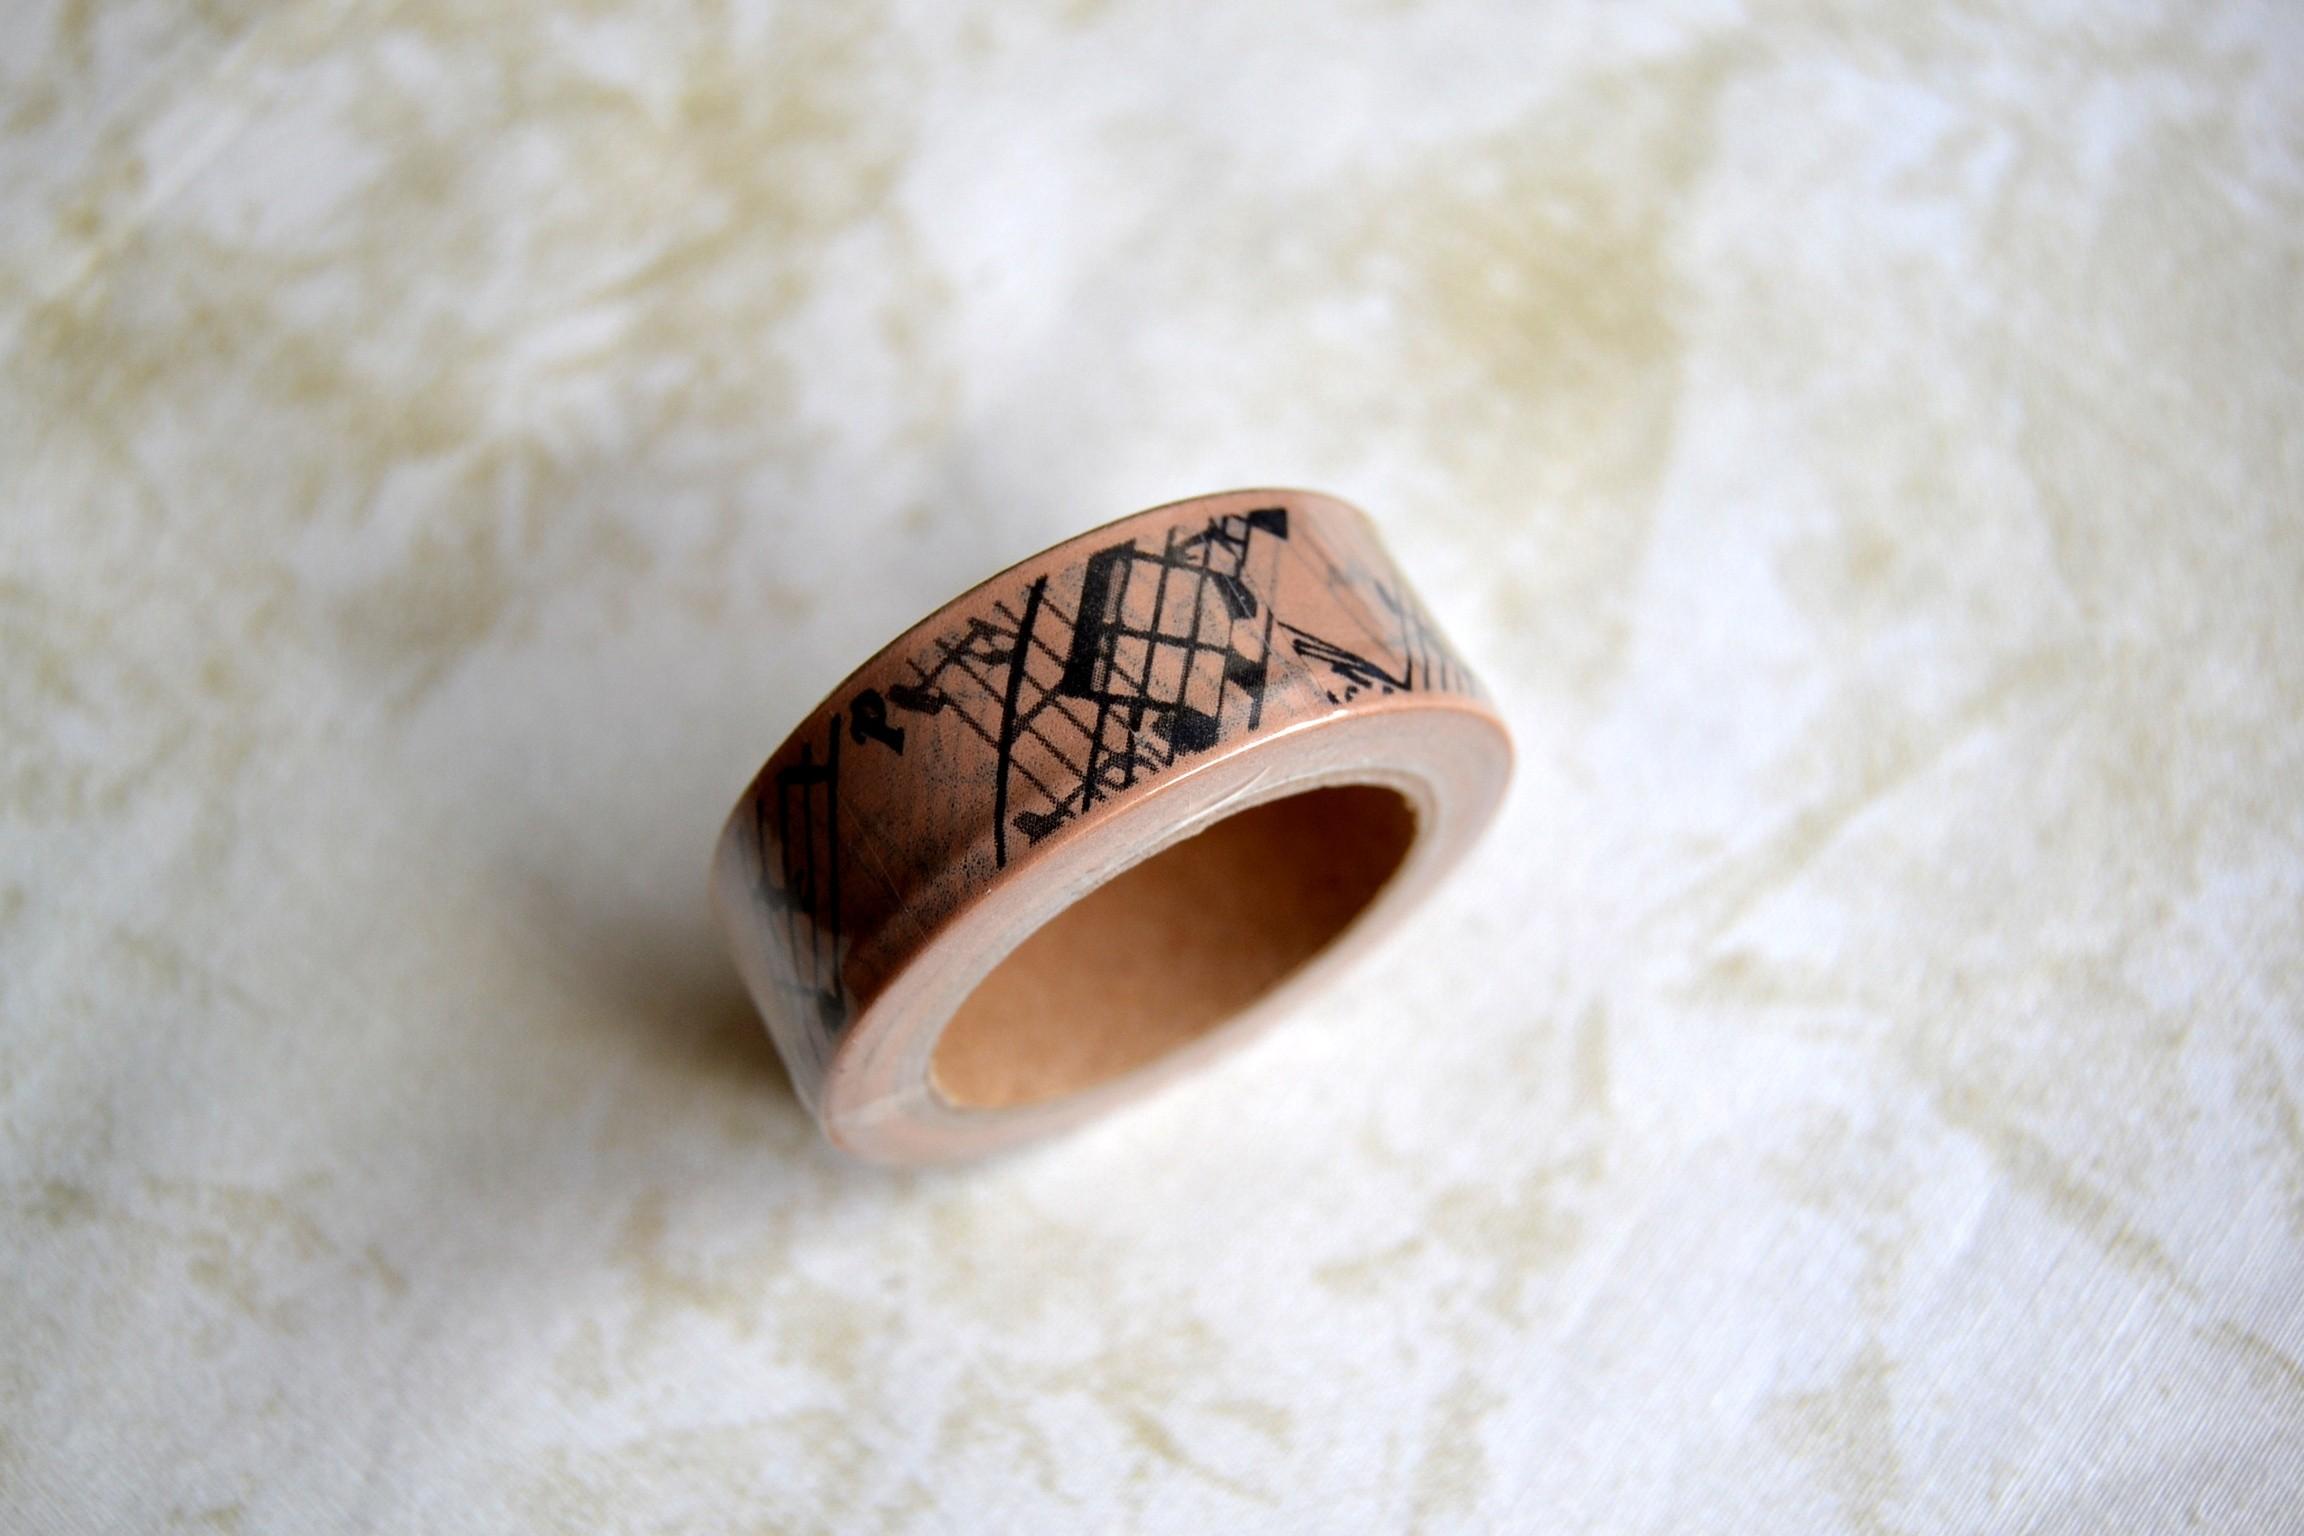 9b271dec1 http://scrapeatodo.com/ 1.0 daily http://scrapeatodo.com/madera/9 ...